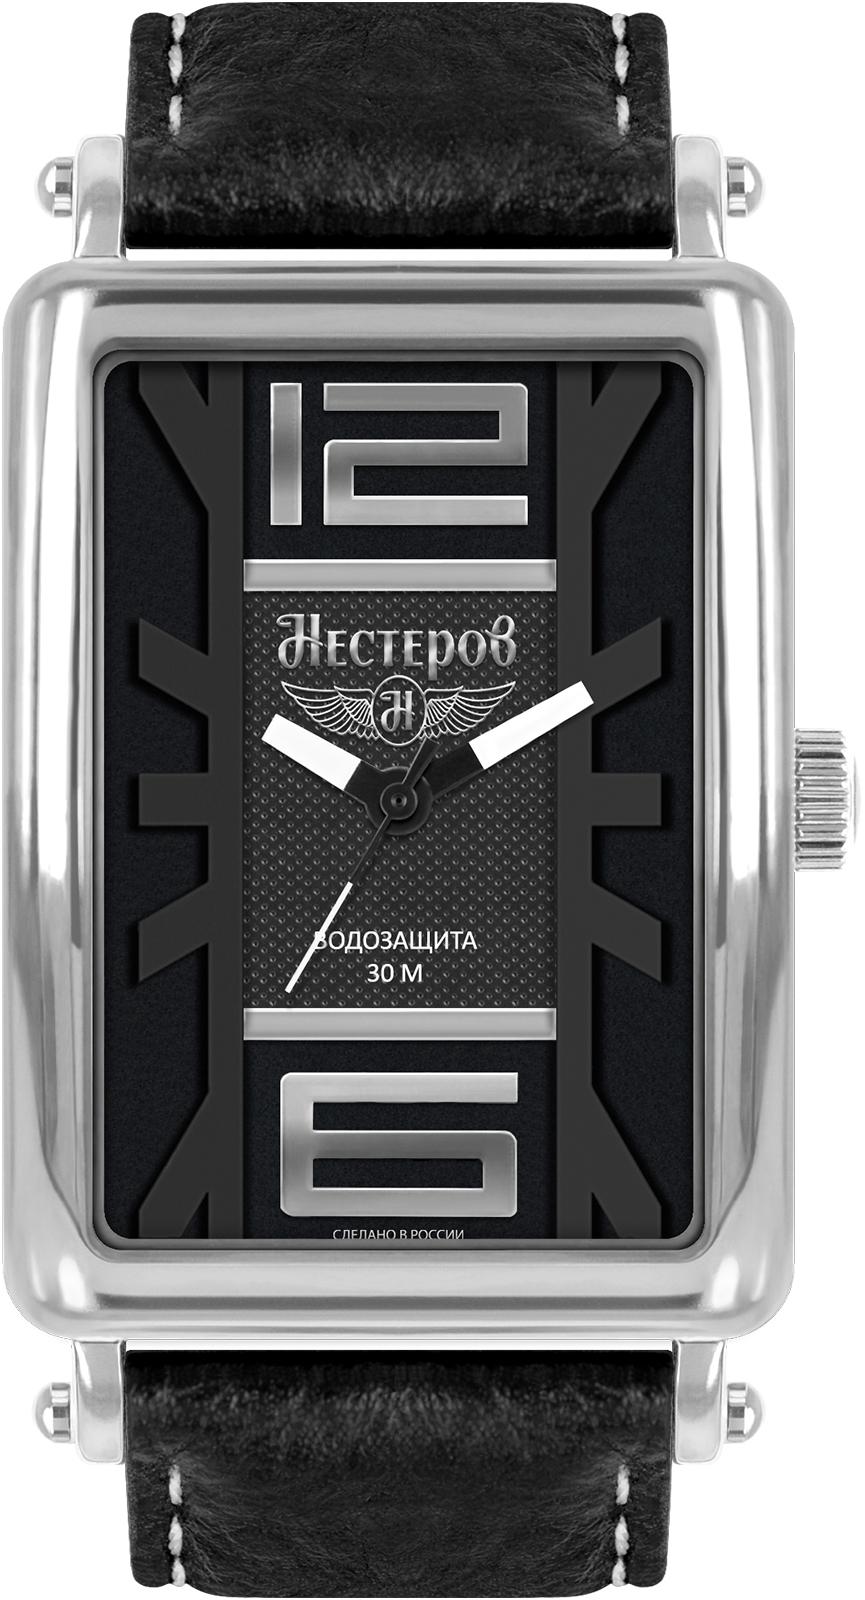 Наручные часы Нестеров H0264B02-05E часы классика мужские наручные